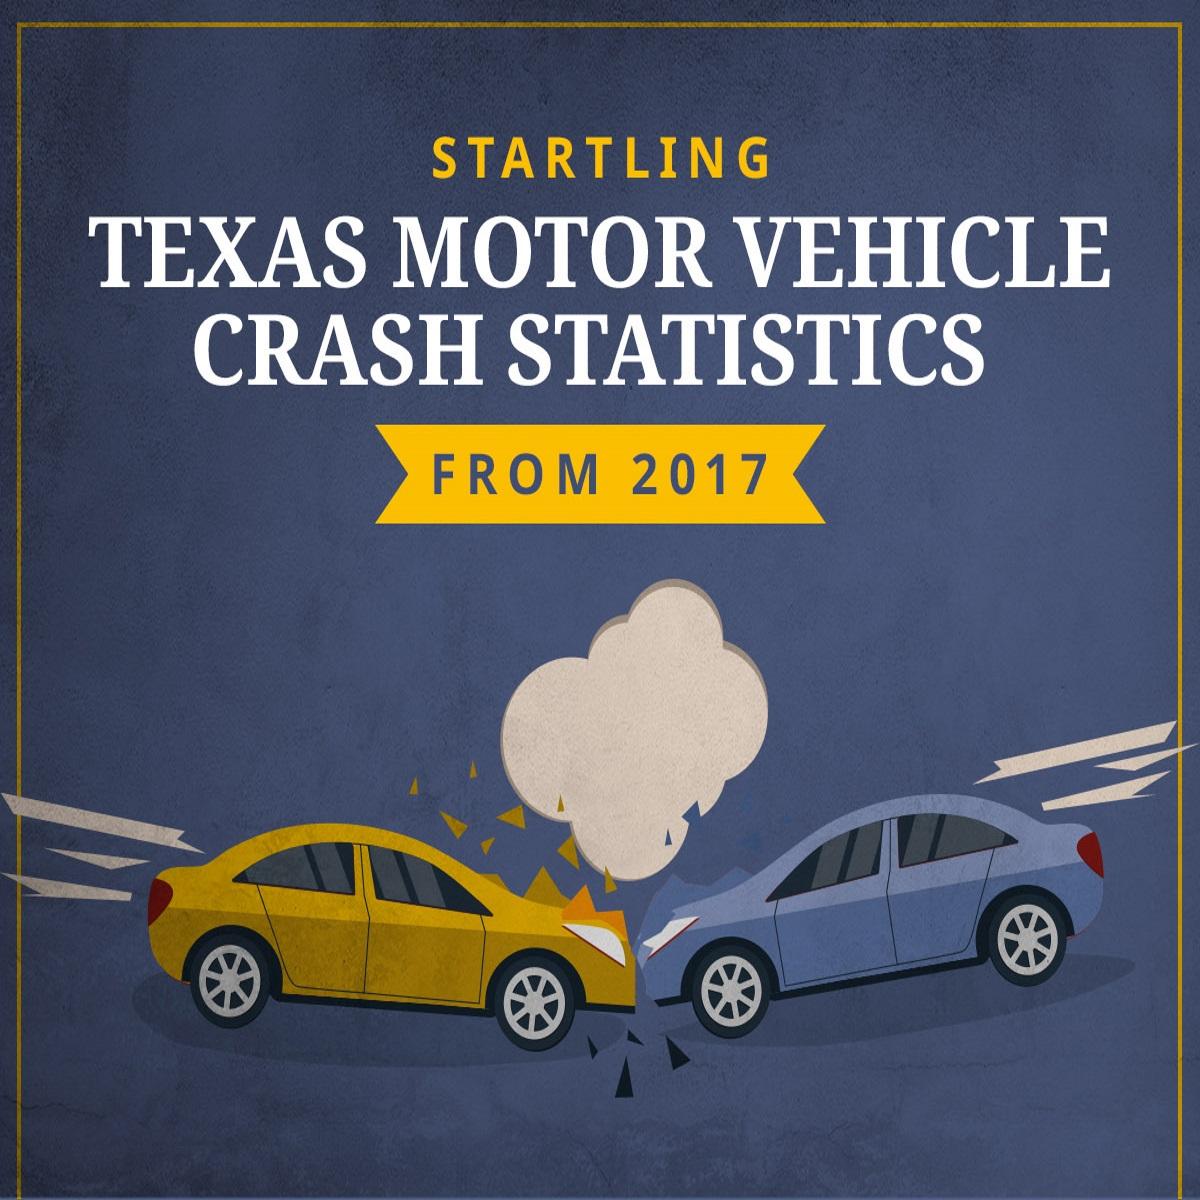 Startling 2017 Texas Crash Statistics